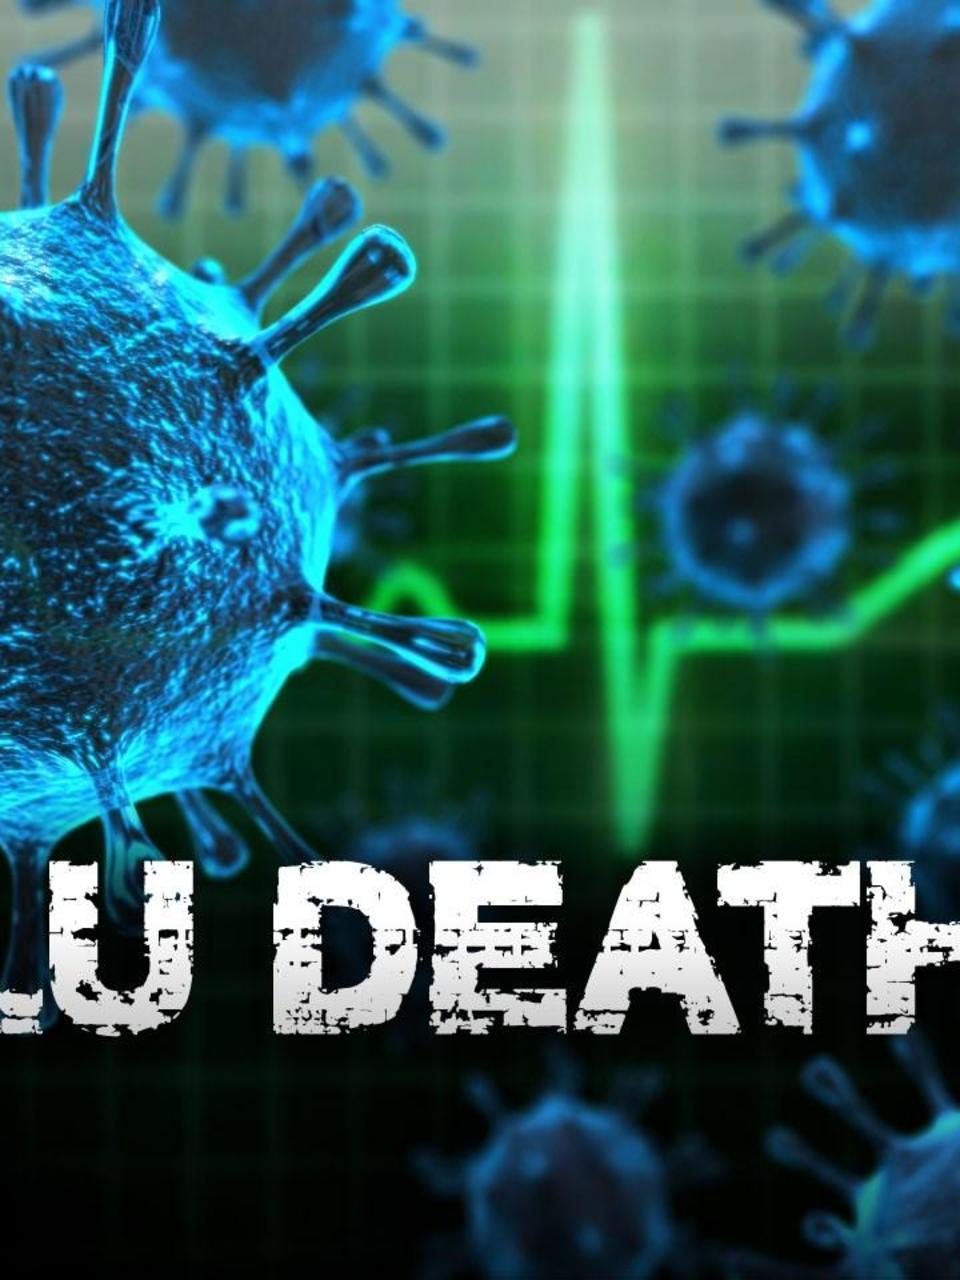 OSDH: Oklahoma sees first flu death of the season | KOKH